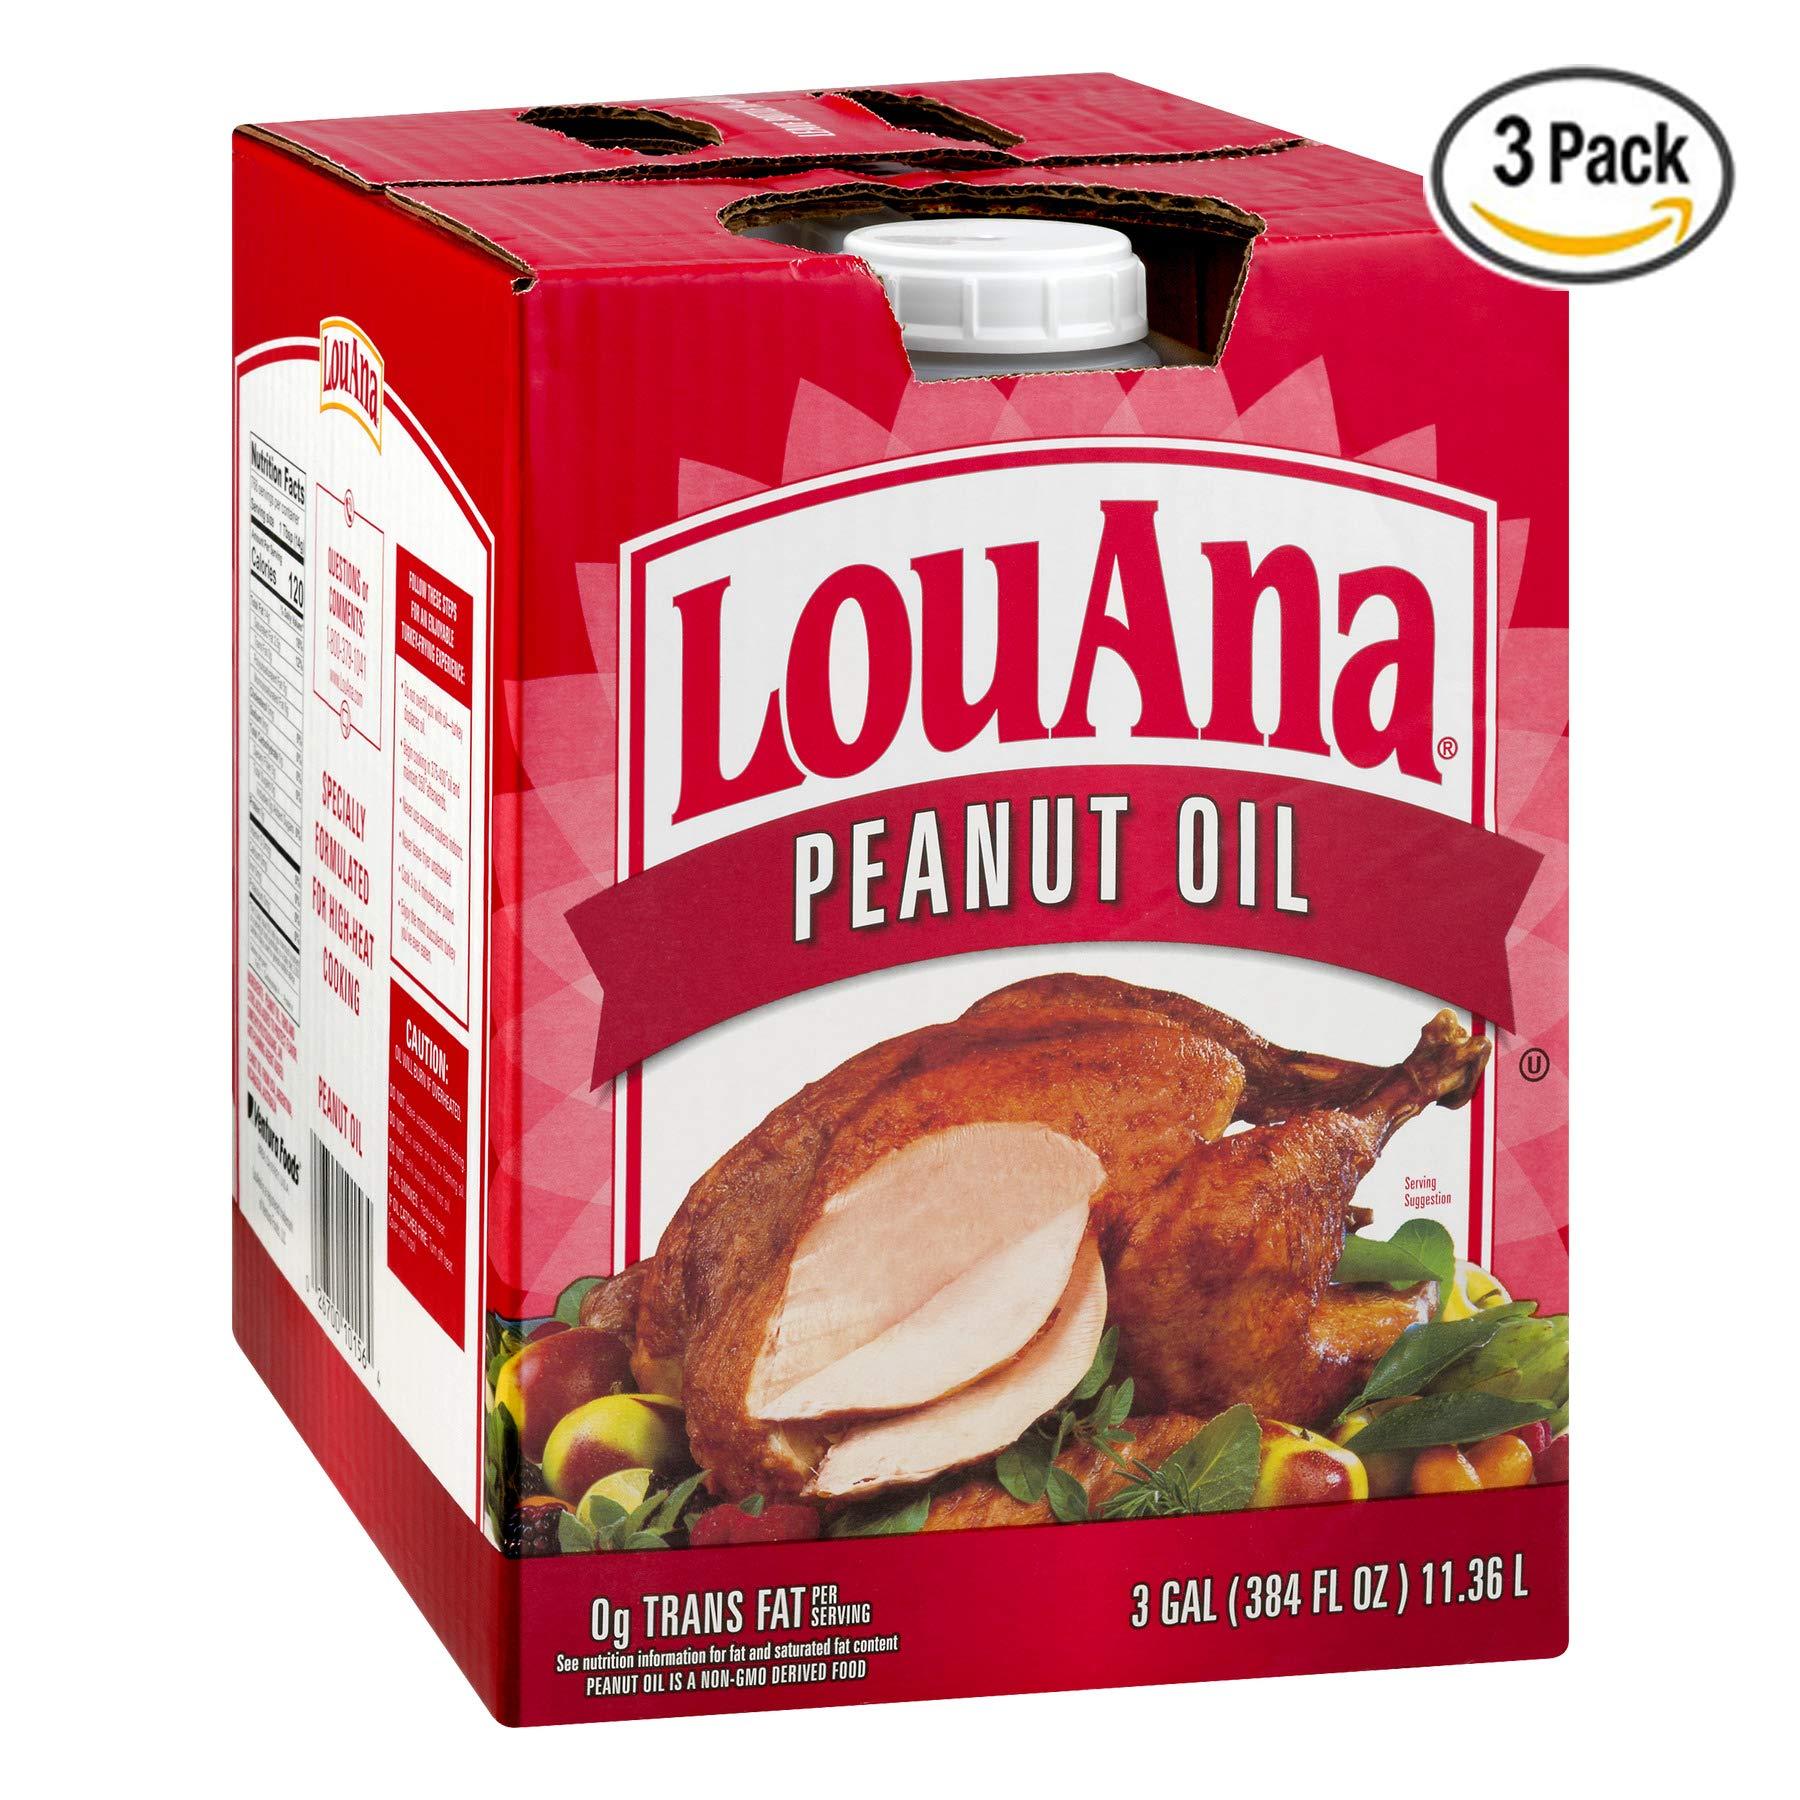 LouAna Peanut Oil, 3 Gallon - Pack of 3 by LouAna